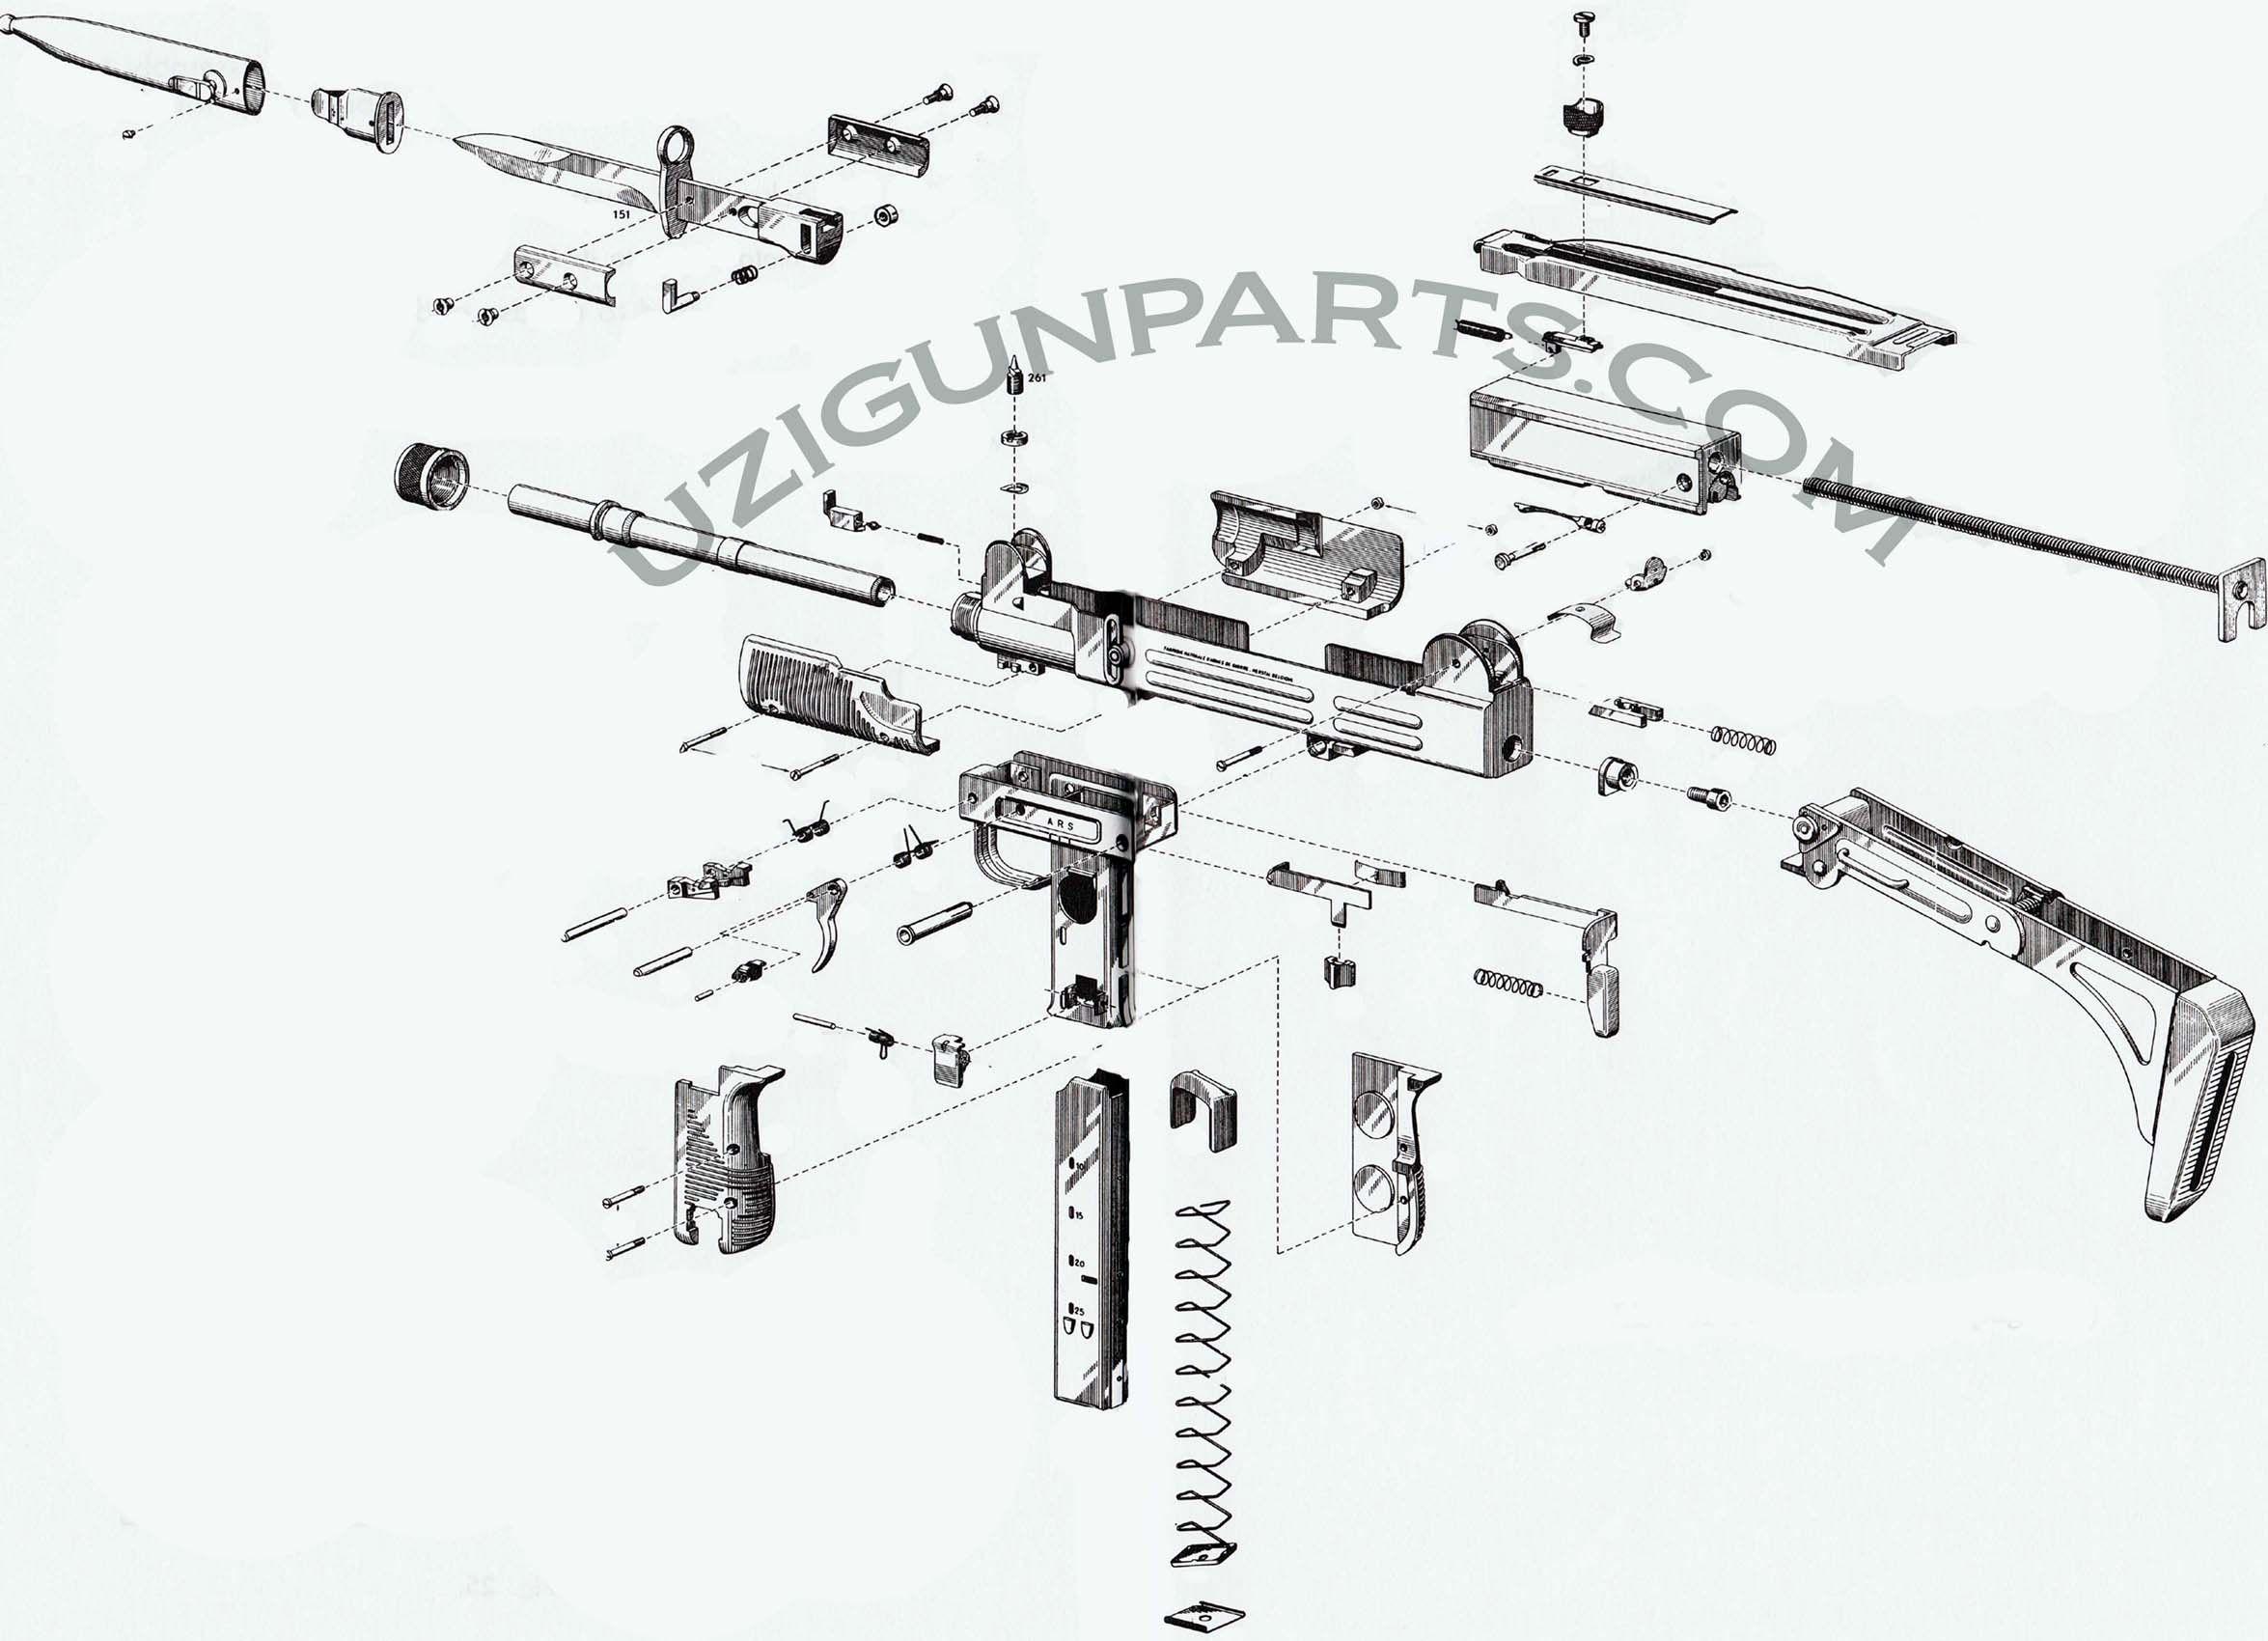 Generic Semi Auto Handgun Parts Diagram 3 Pin Led Rocker Switch Wiring Uzi Google Search Огнестрел Pinterest